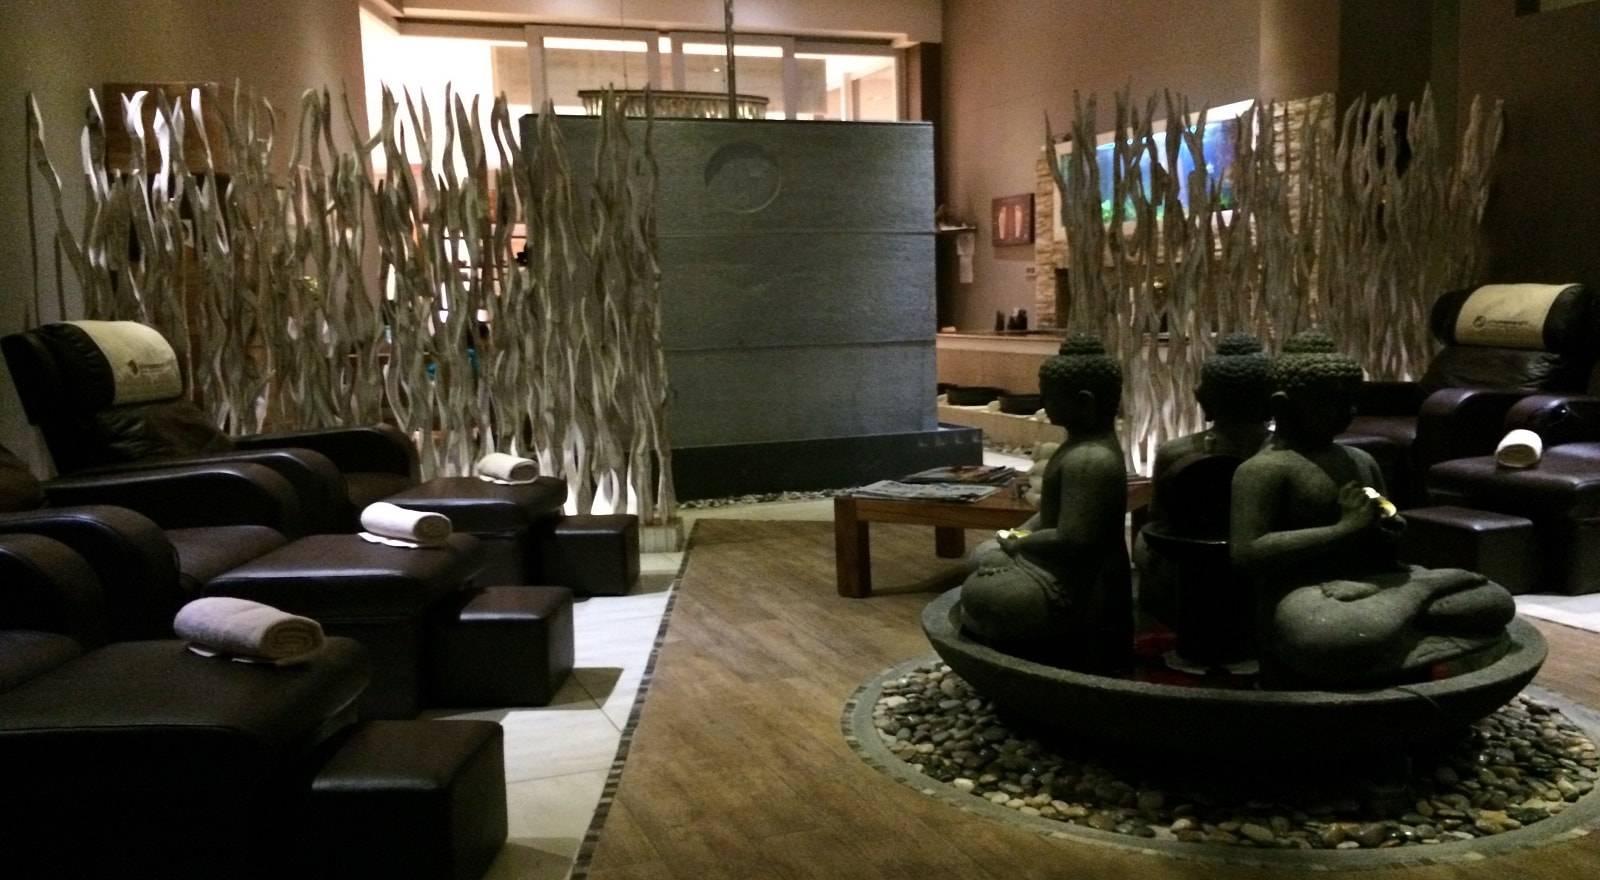 Spa Experience - Ancient Shiro Ayurvedic